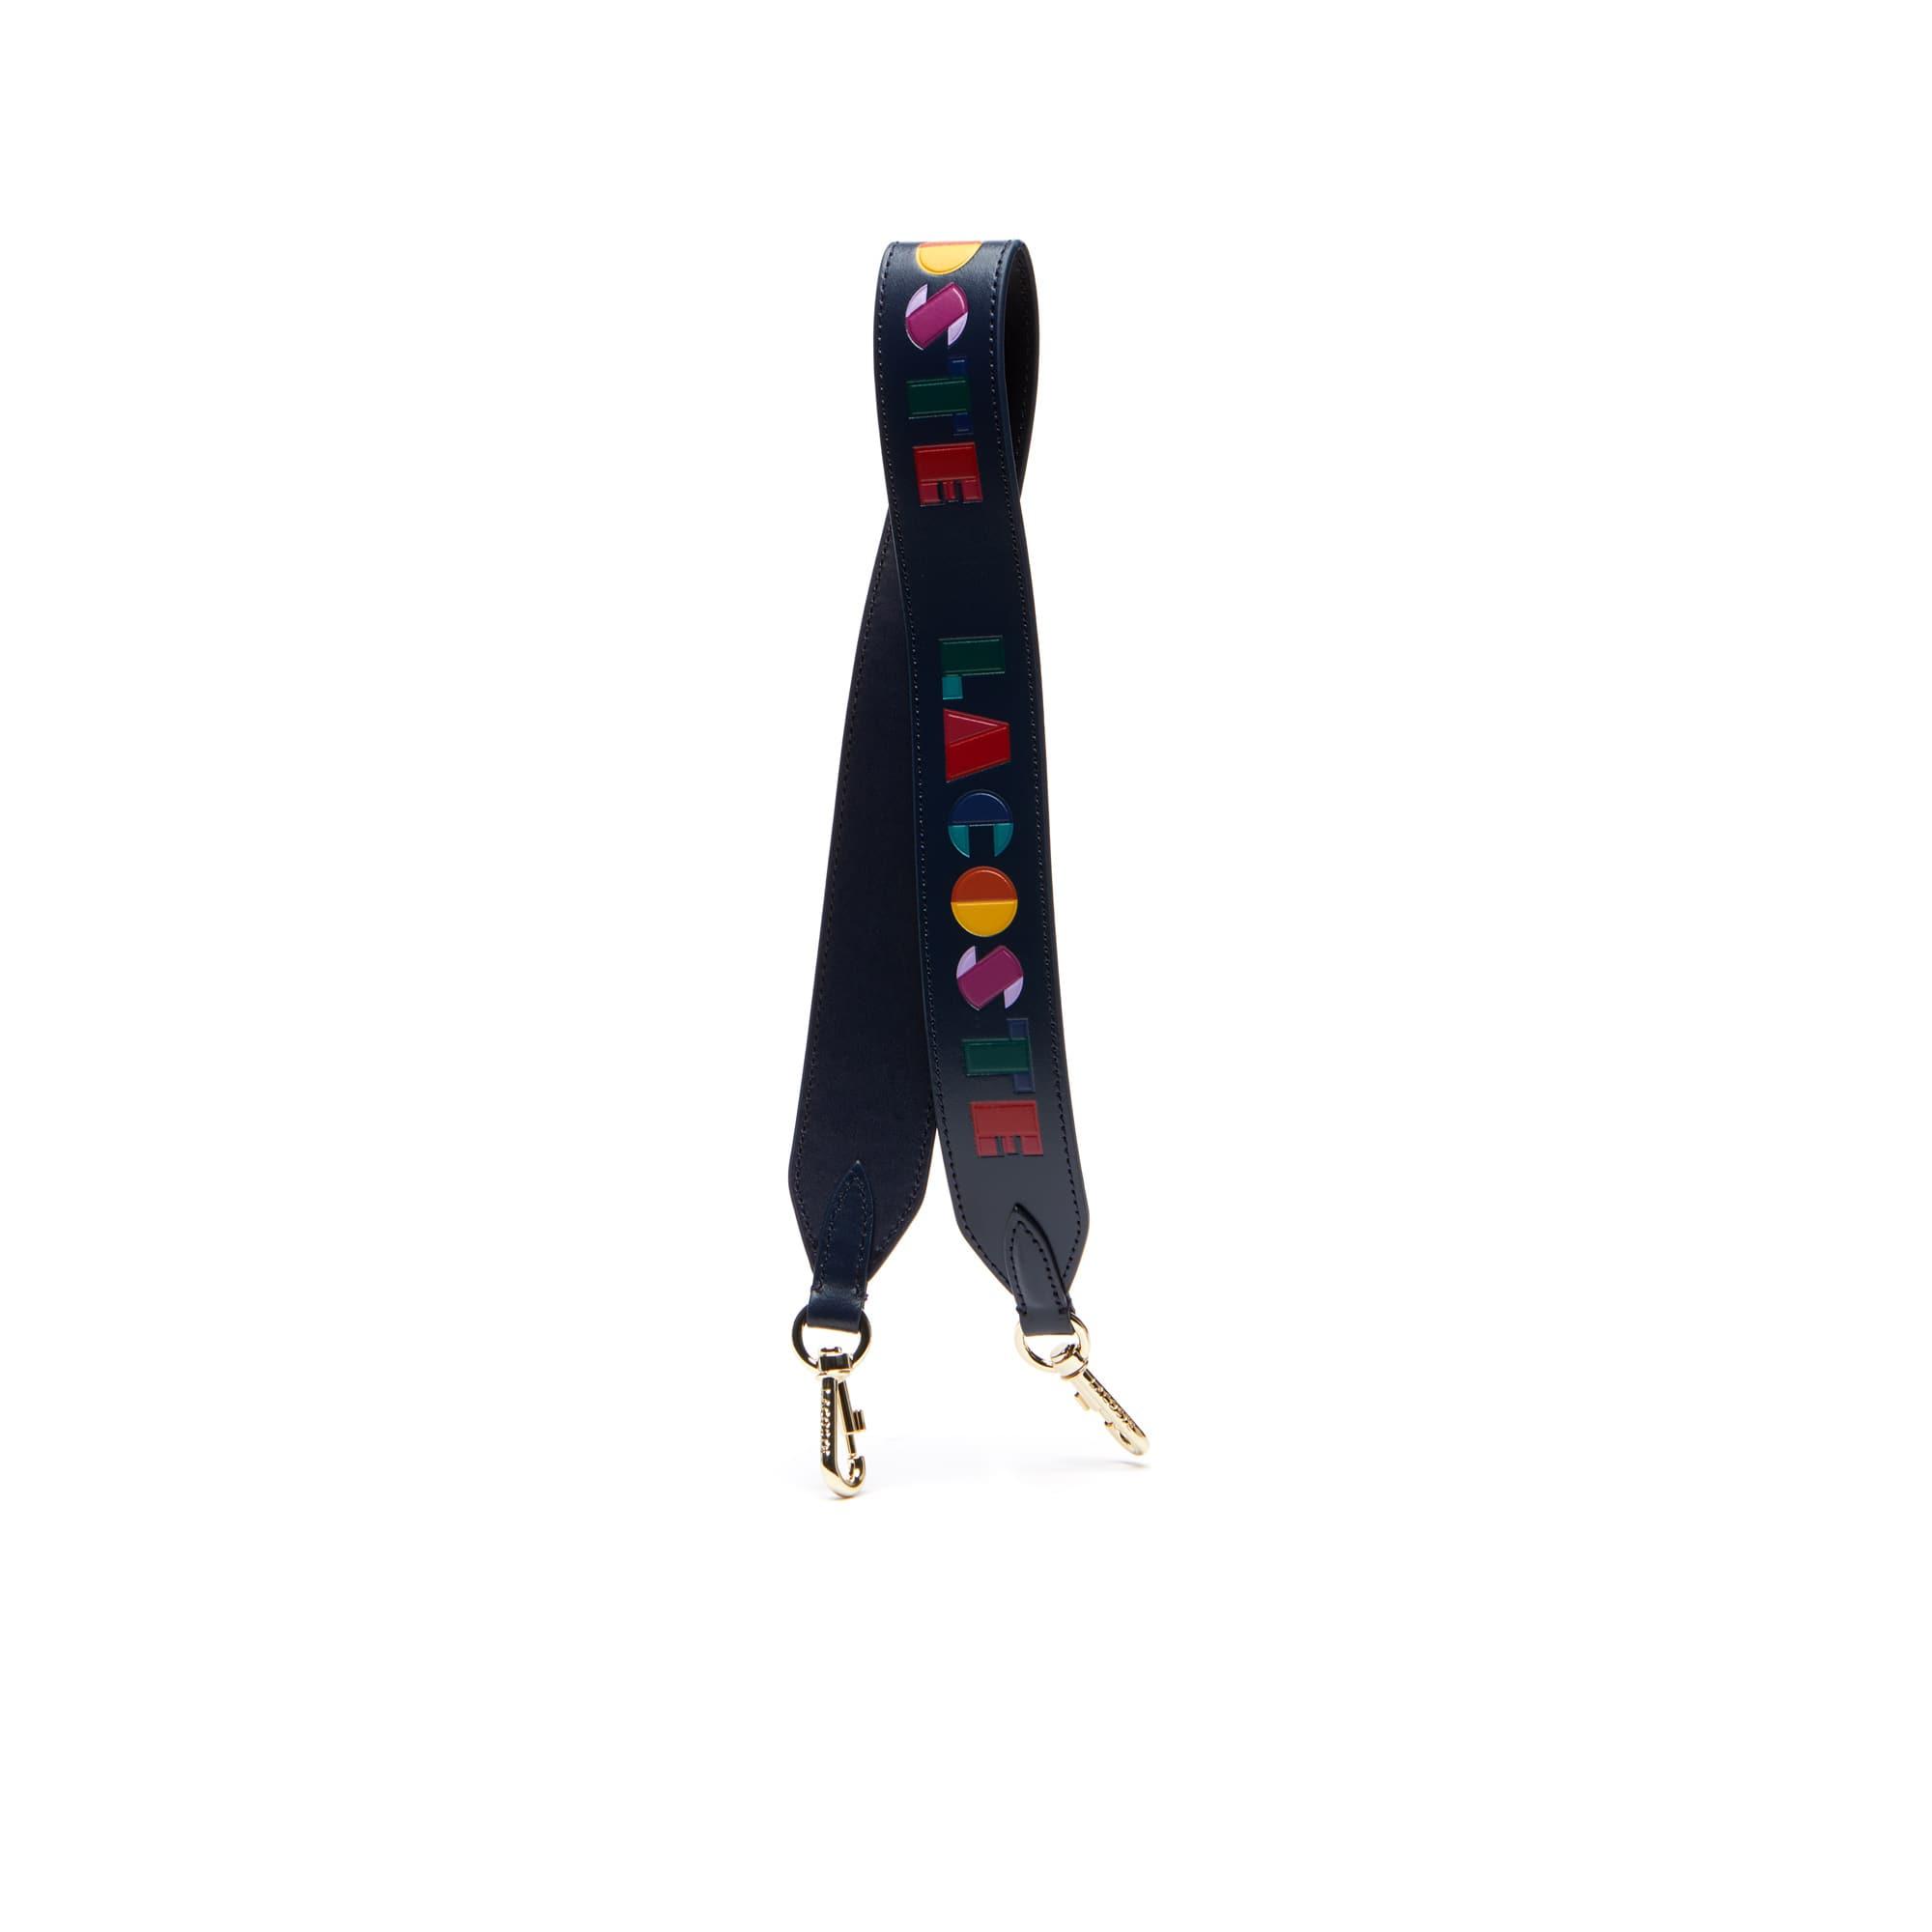 Fancy Straps-schouderband dames leer met gekleurde Lacoste-letters